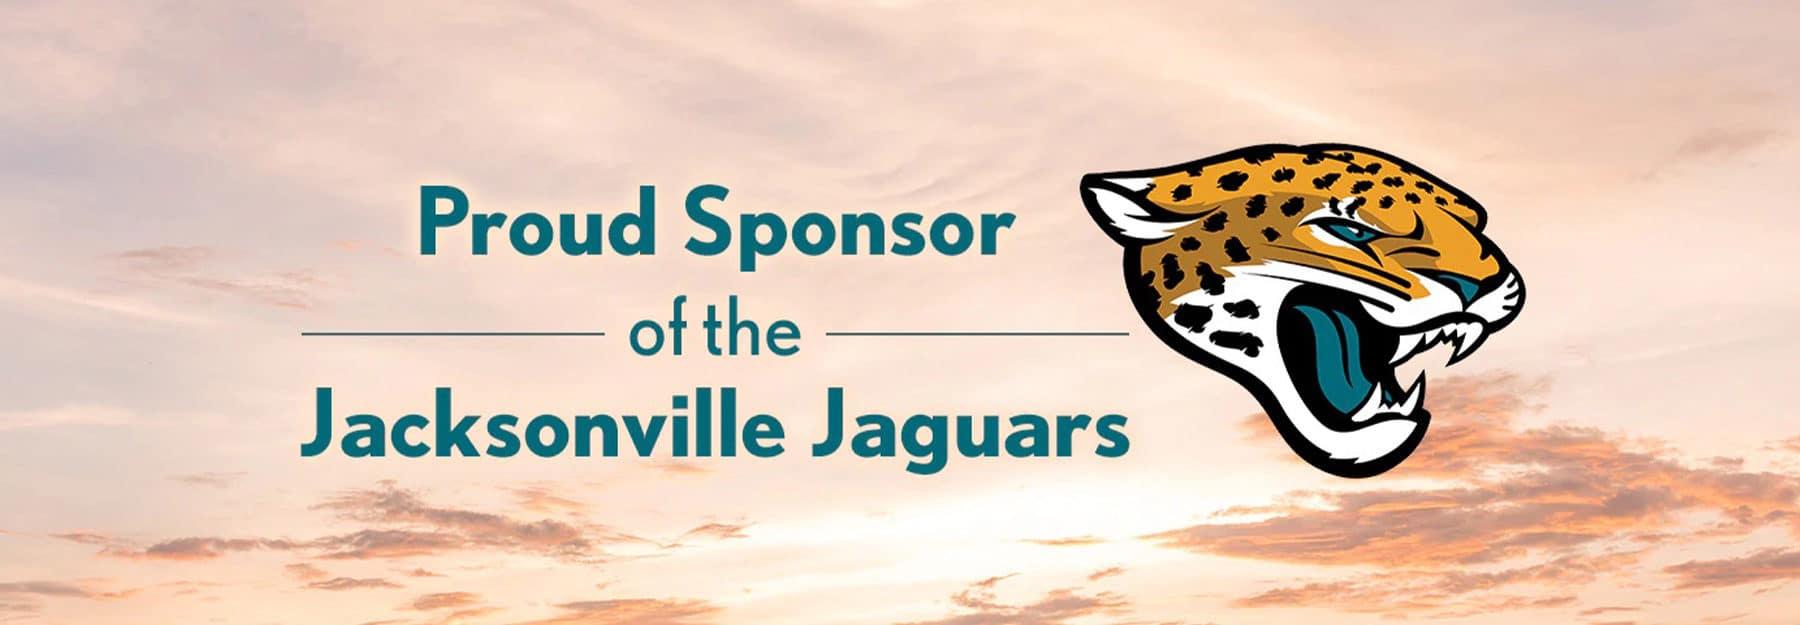 Jacksonville Jaguars Proud Sponsor